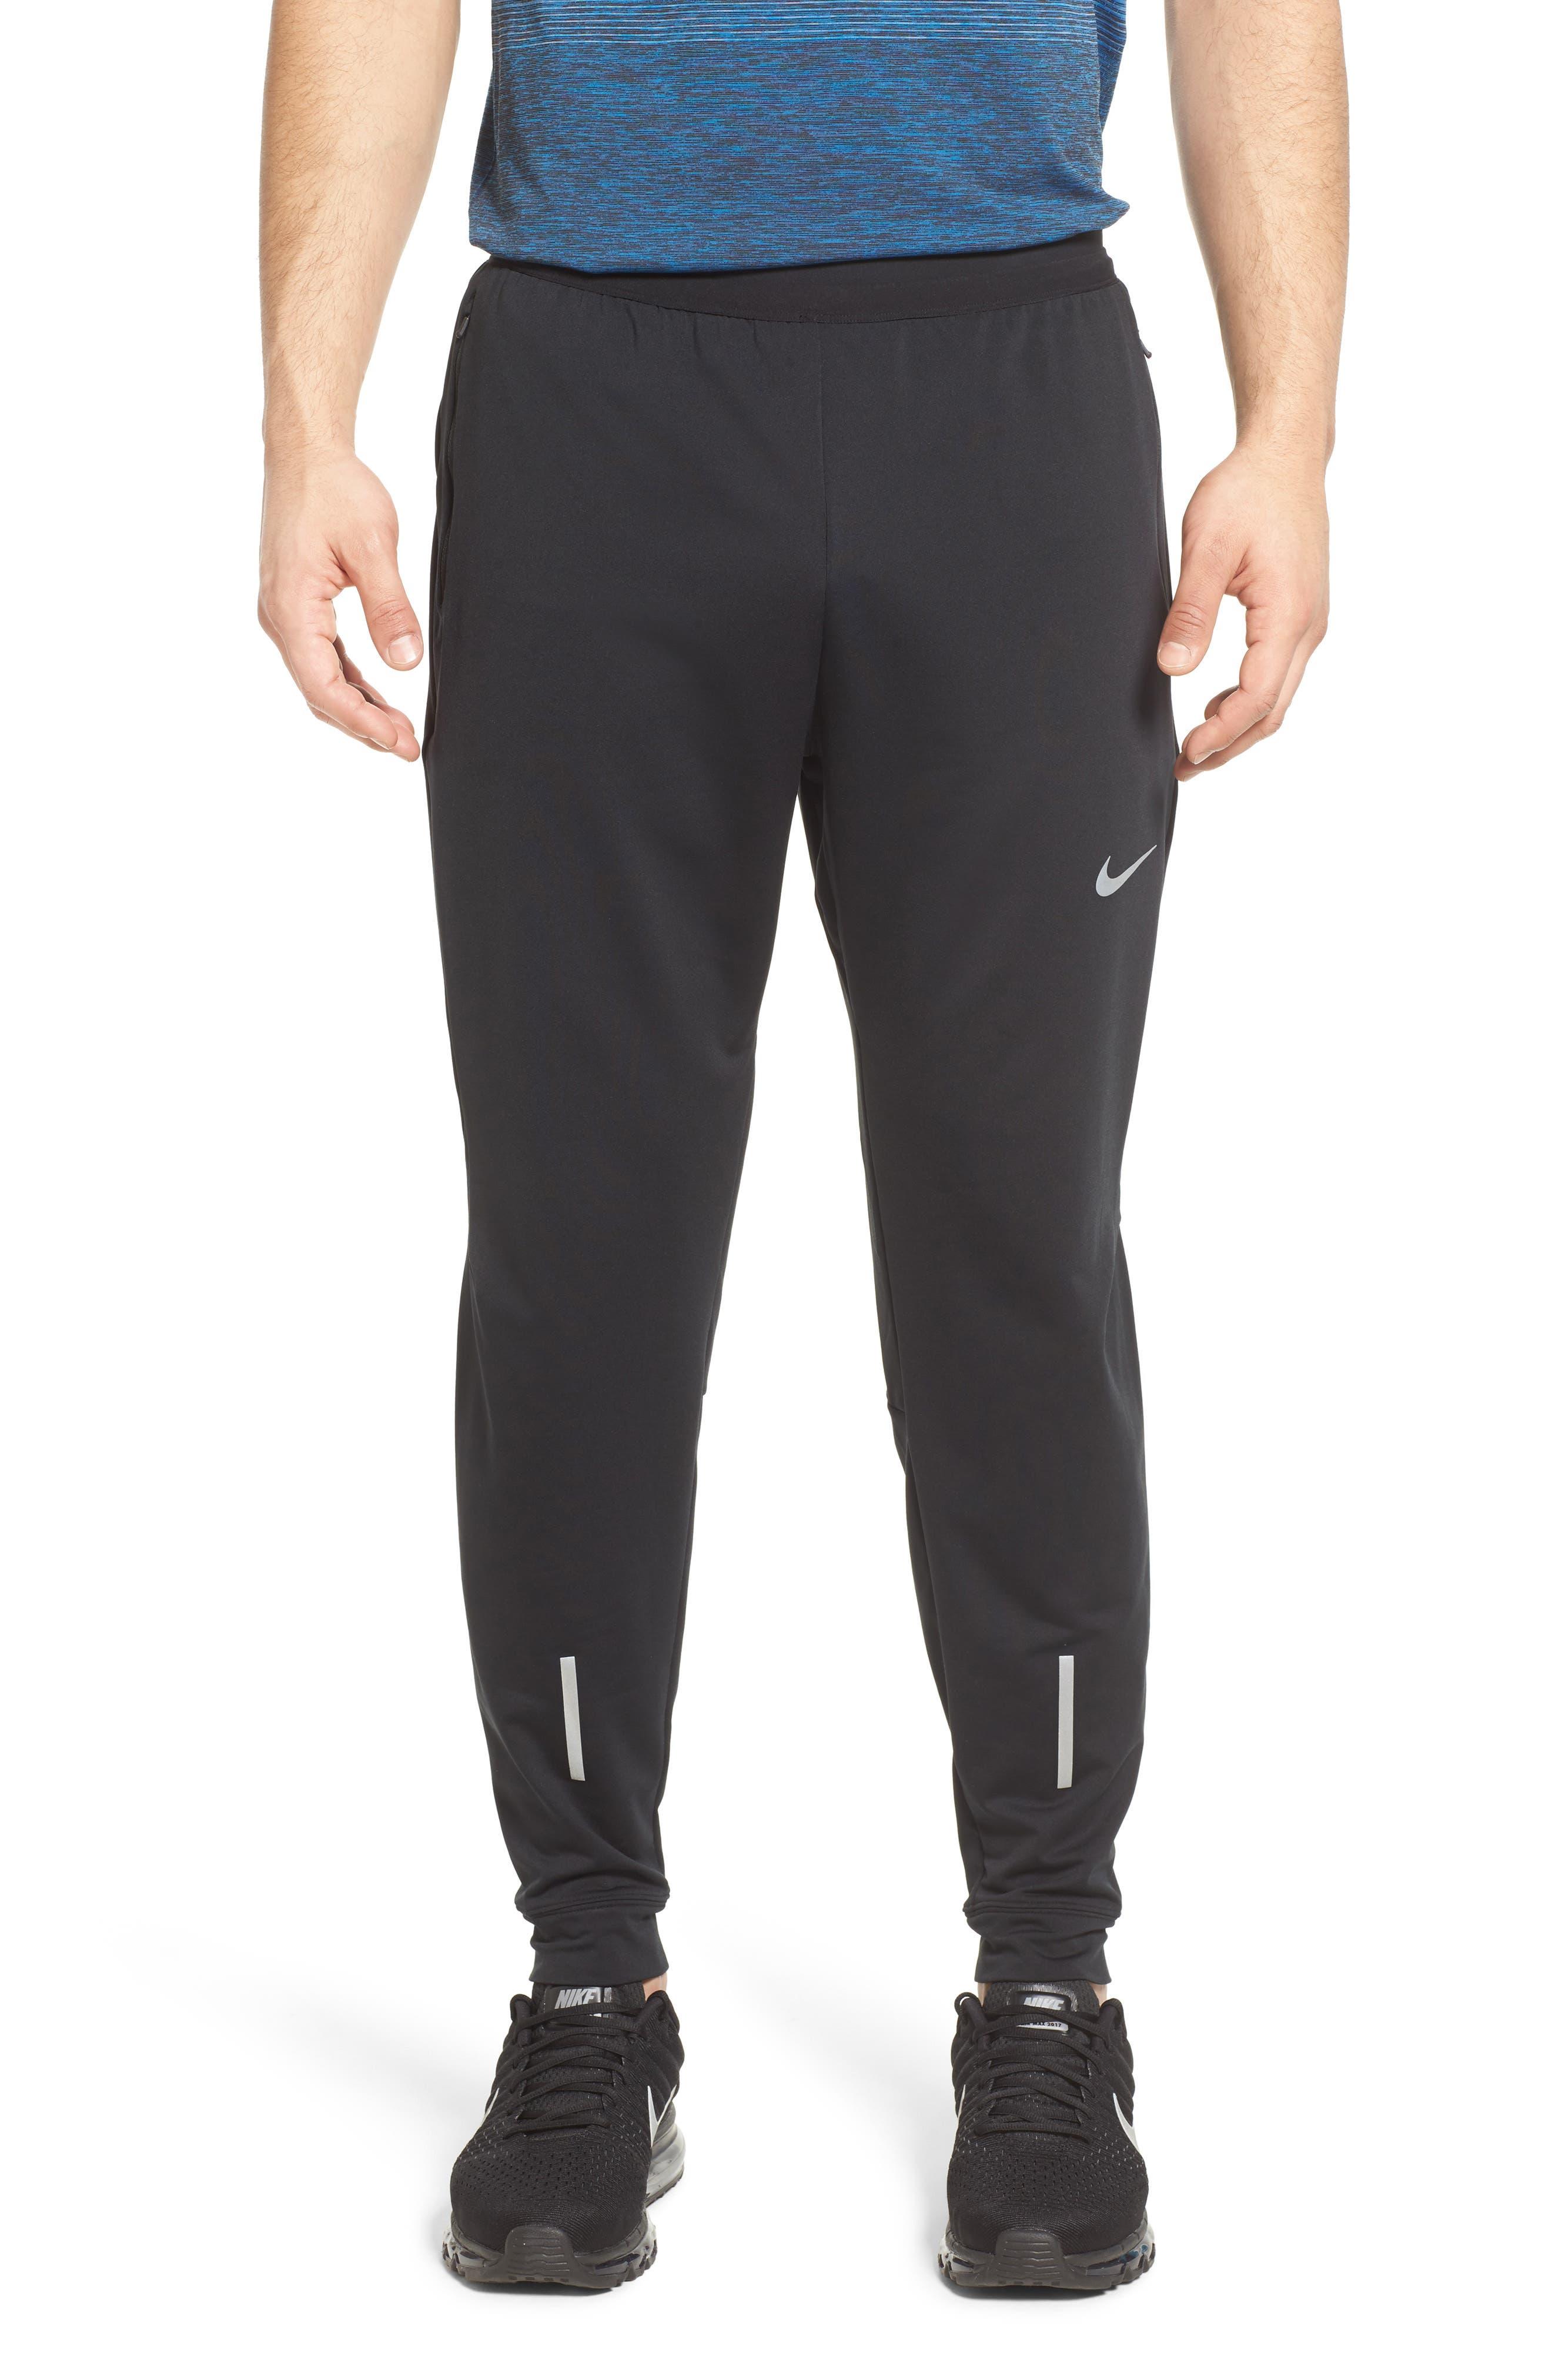 Dry Running Pants,                             Main thumbnail 1, color,                             Black